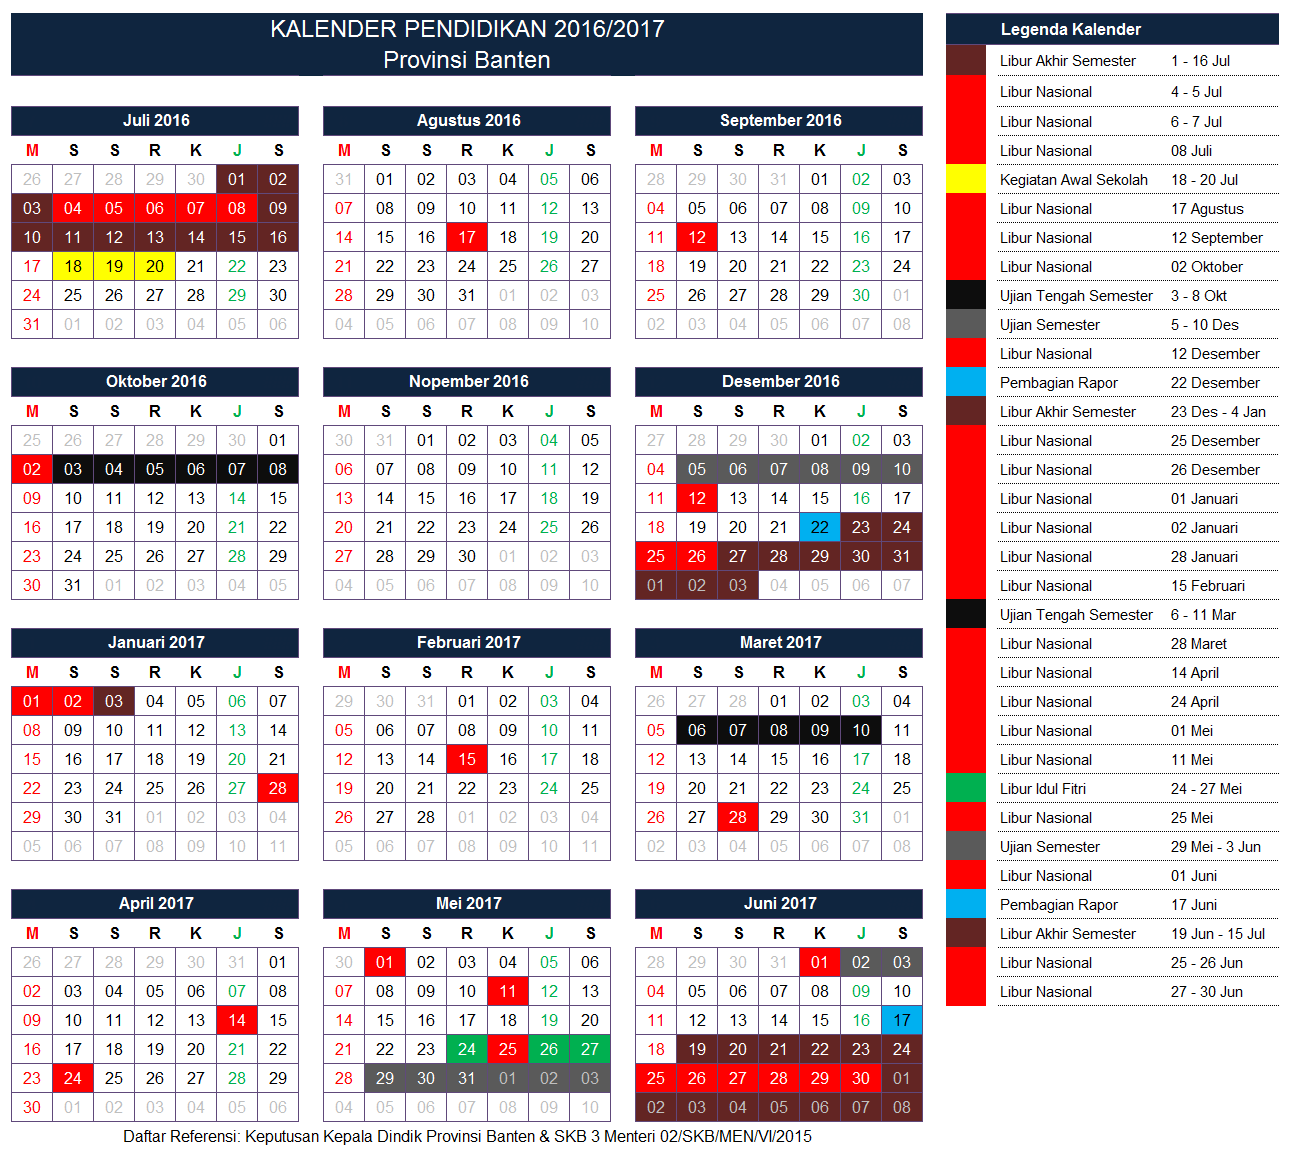 Kalender Pendidikan Provinsi Banten